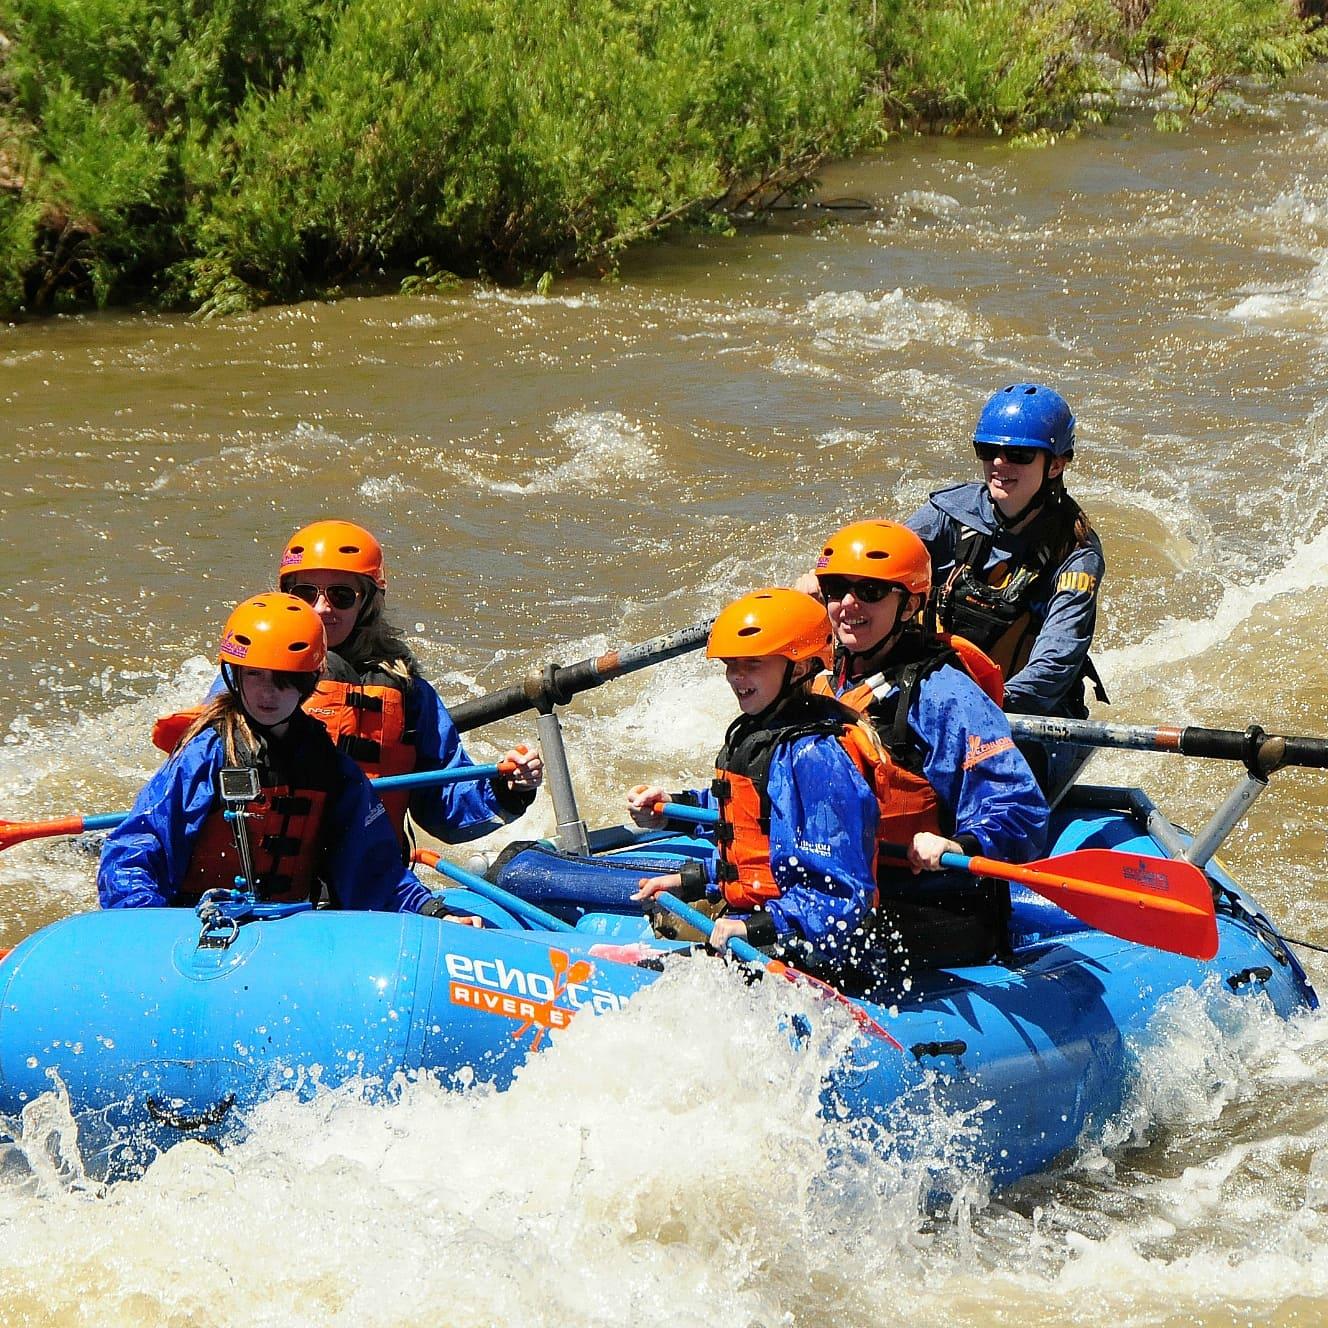 Rafting down the Arkansas River in Canon City, Colorado